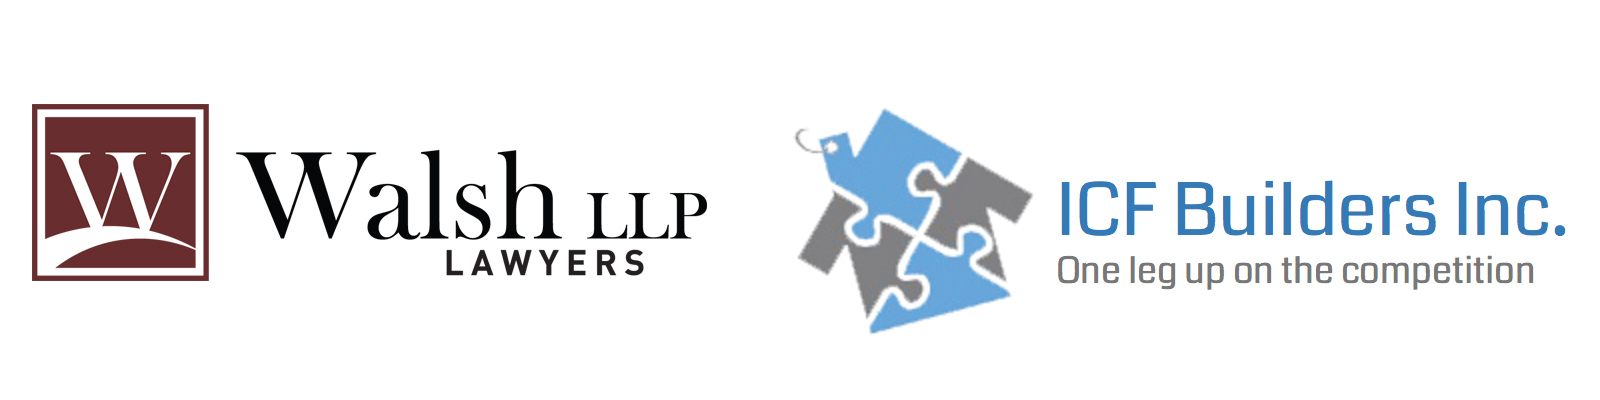 WalshandICF-logo.jpg